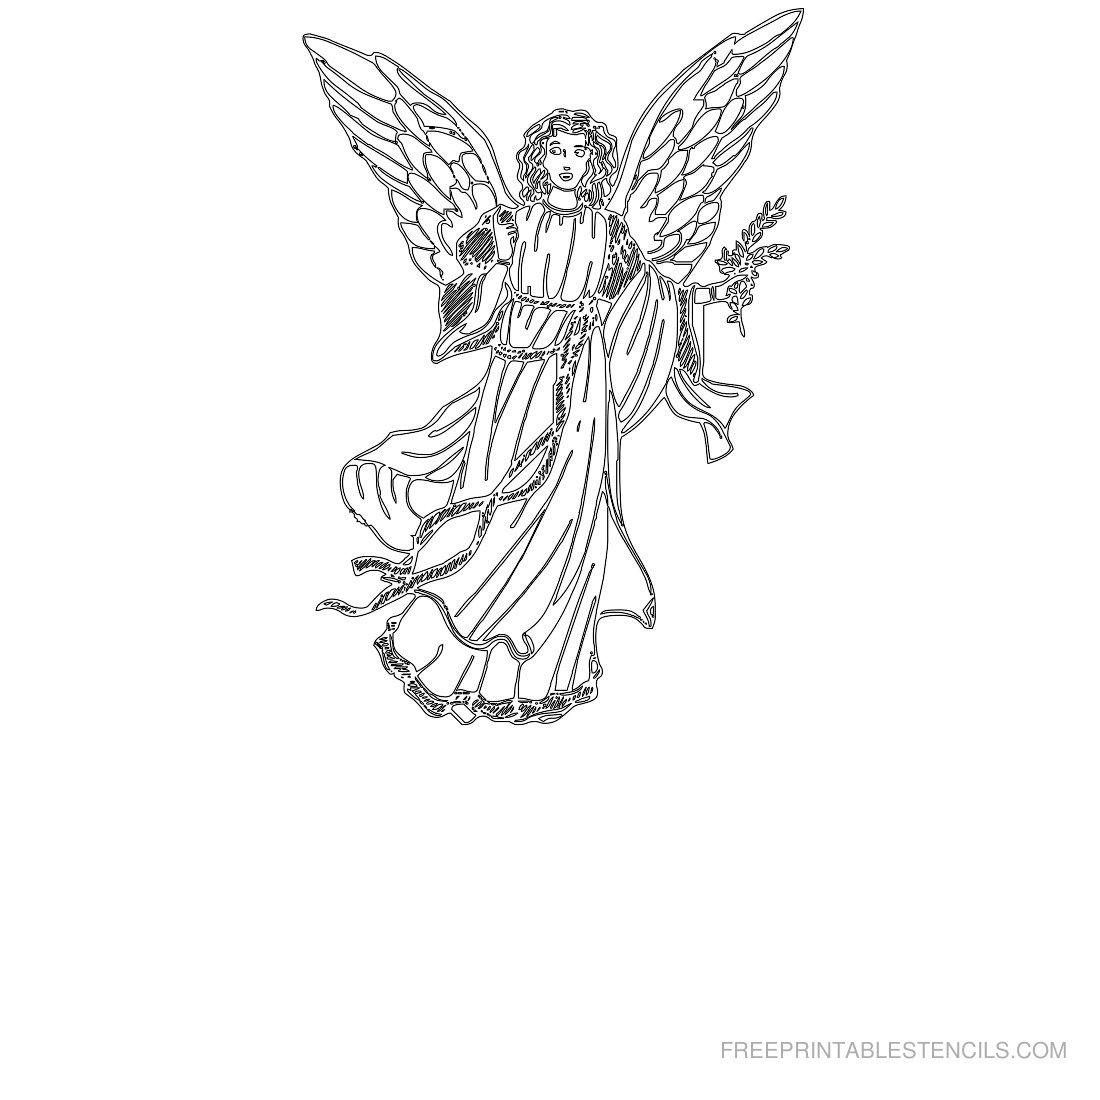 Free Printable Angel Stencils | Free Printable Stencils - Free Printable Angels